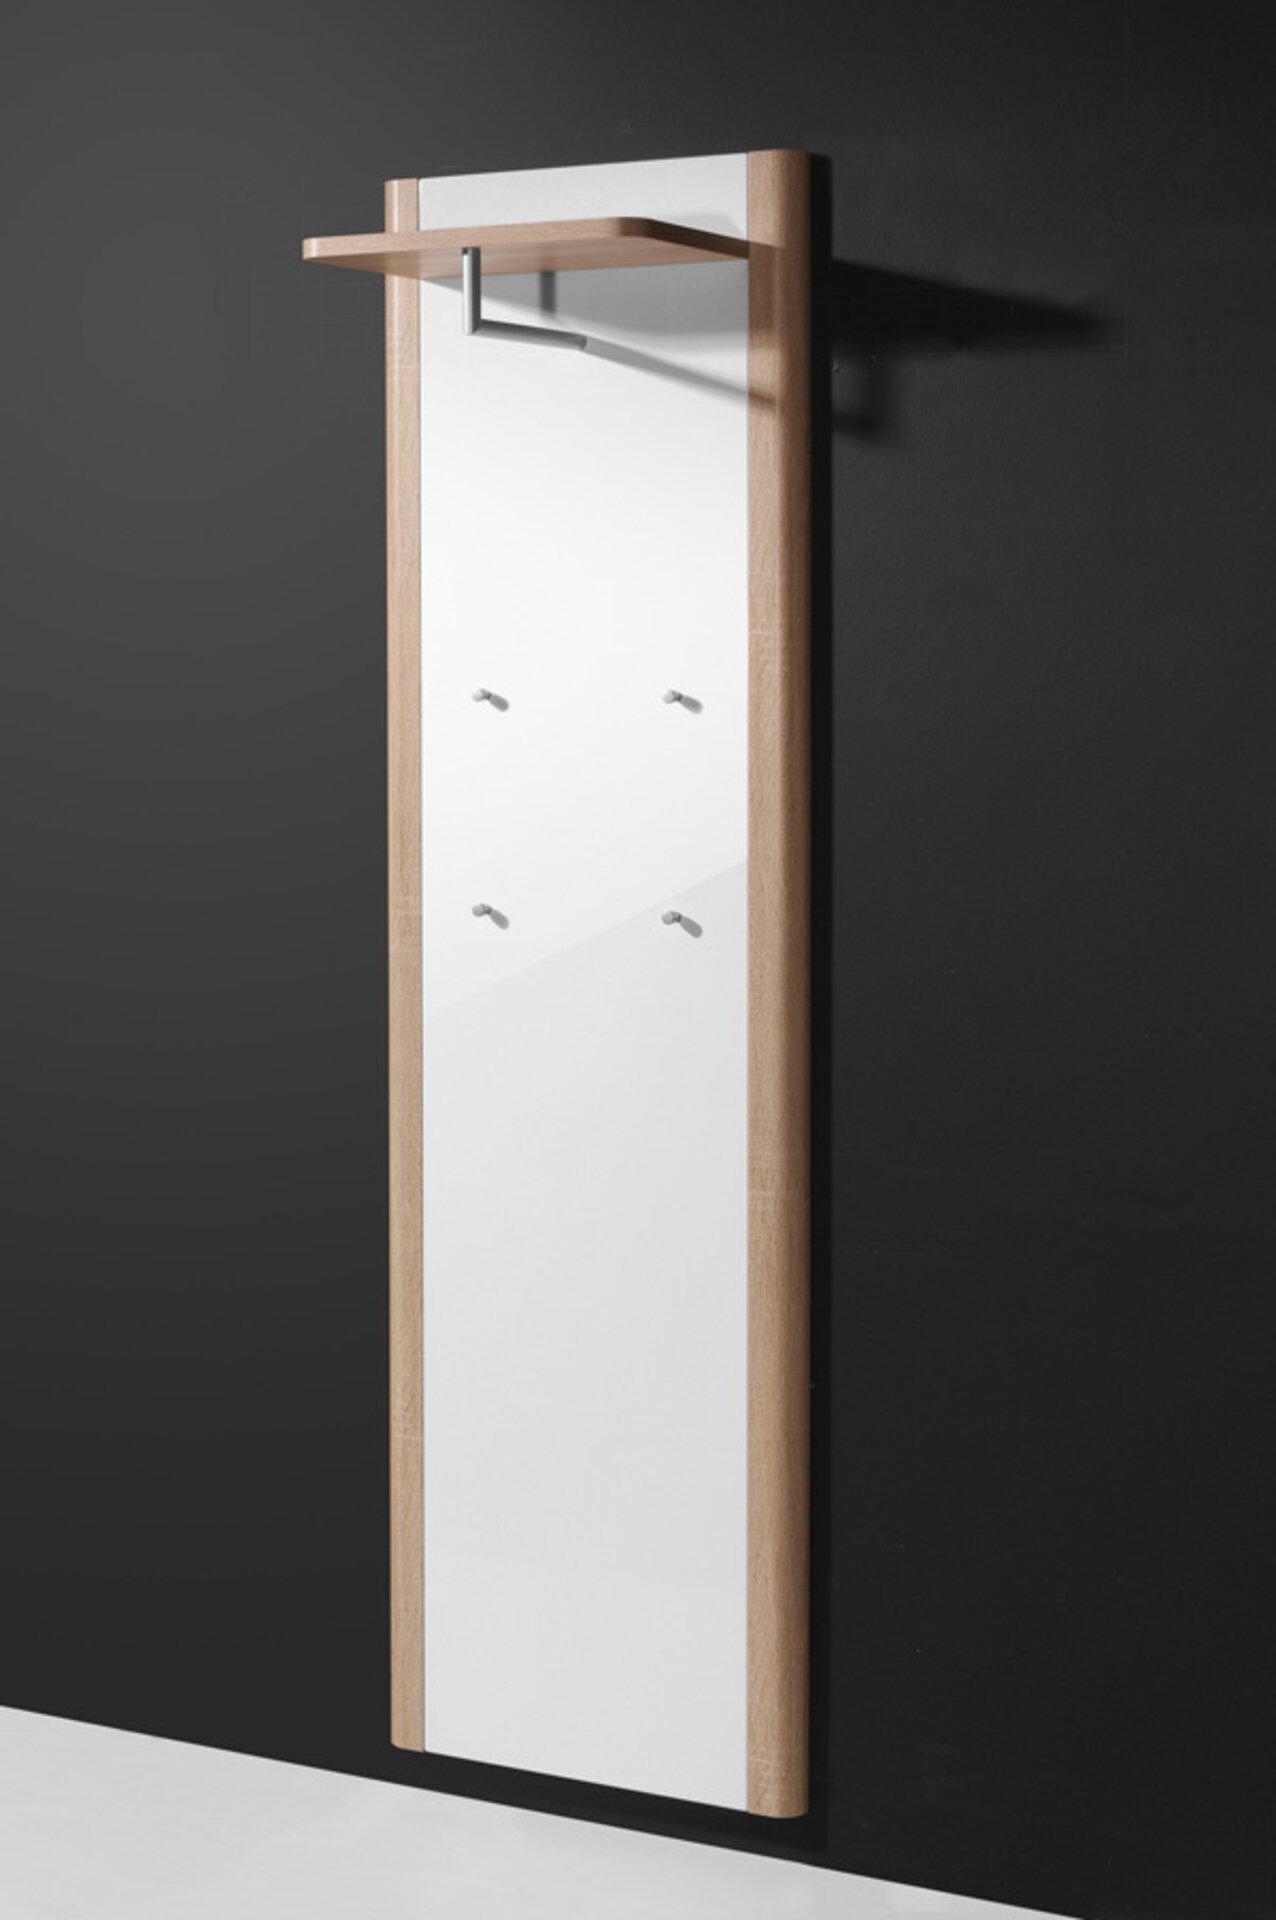 Garderobenpaneel RONDA Vito Holzwerkstoff mehrfarbig 32 x 192 x 57 cm